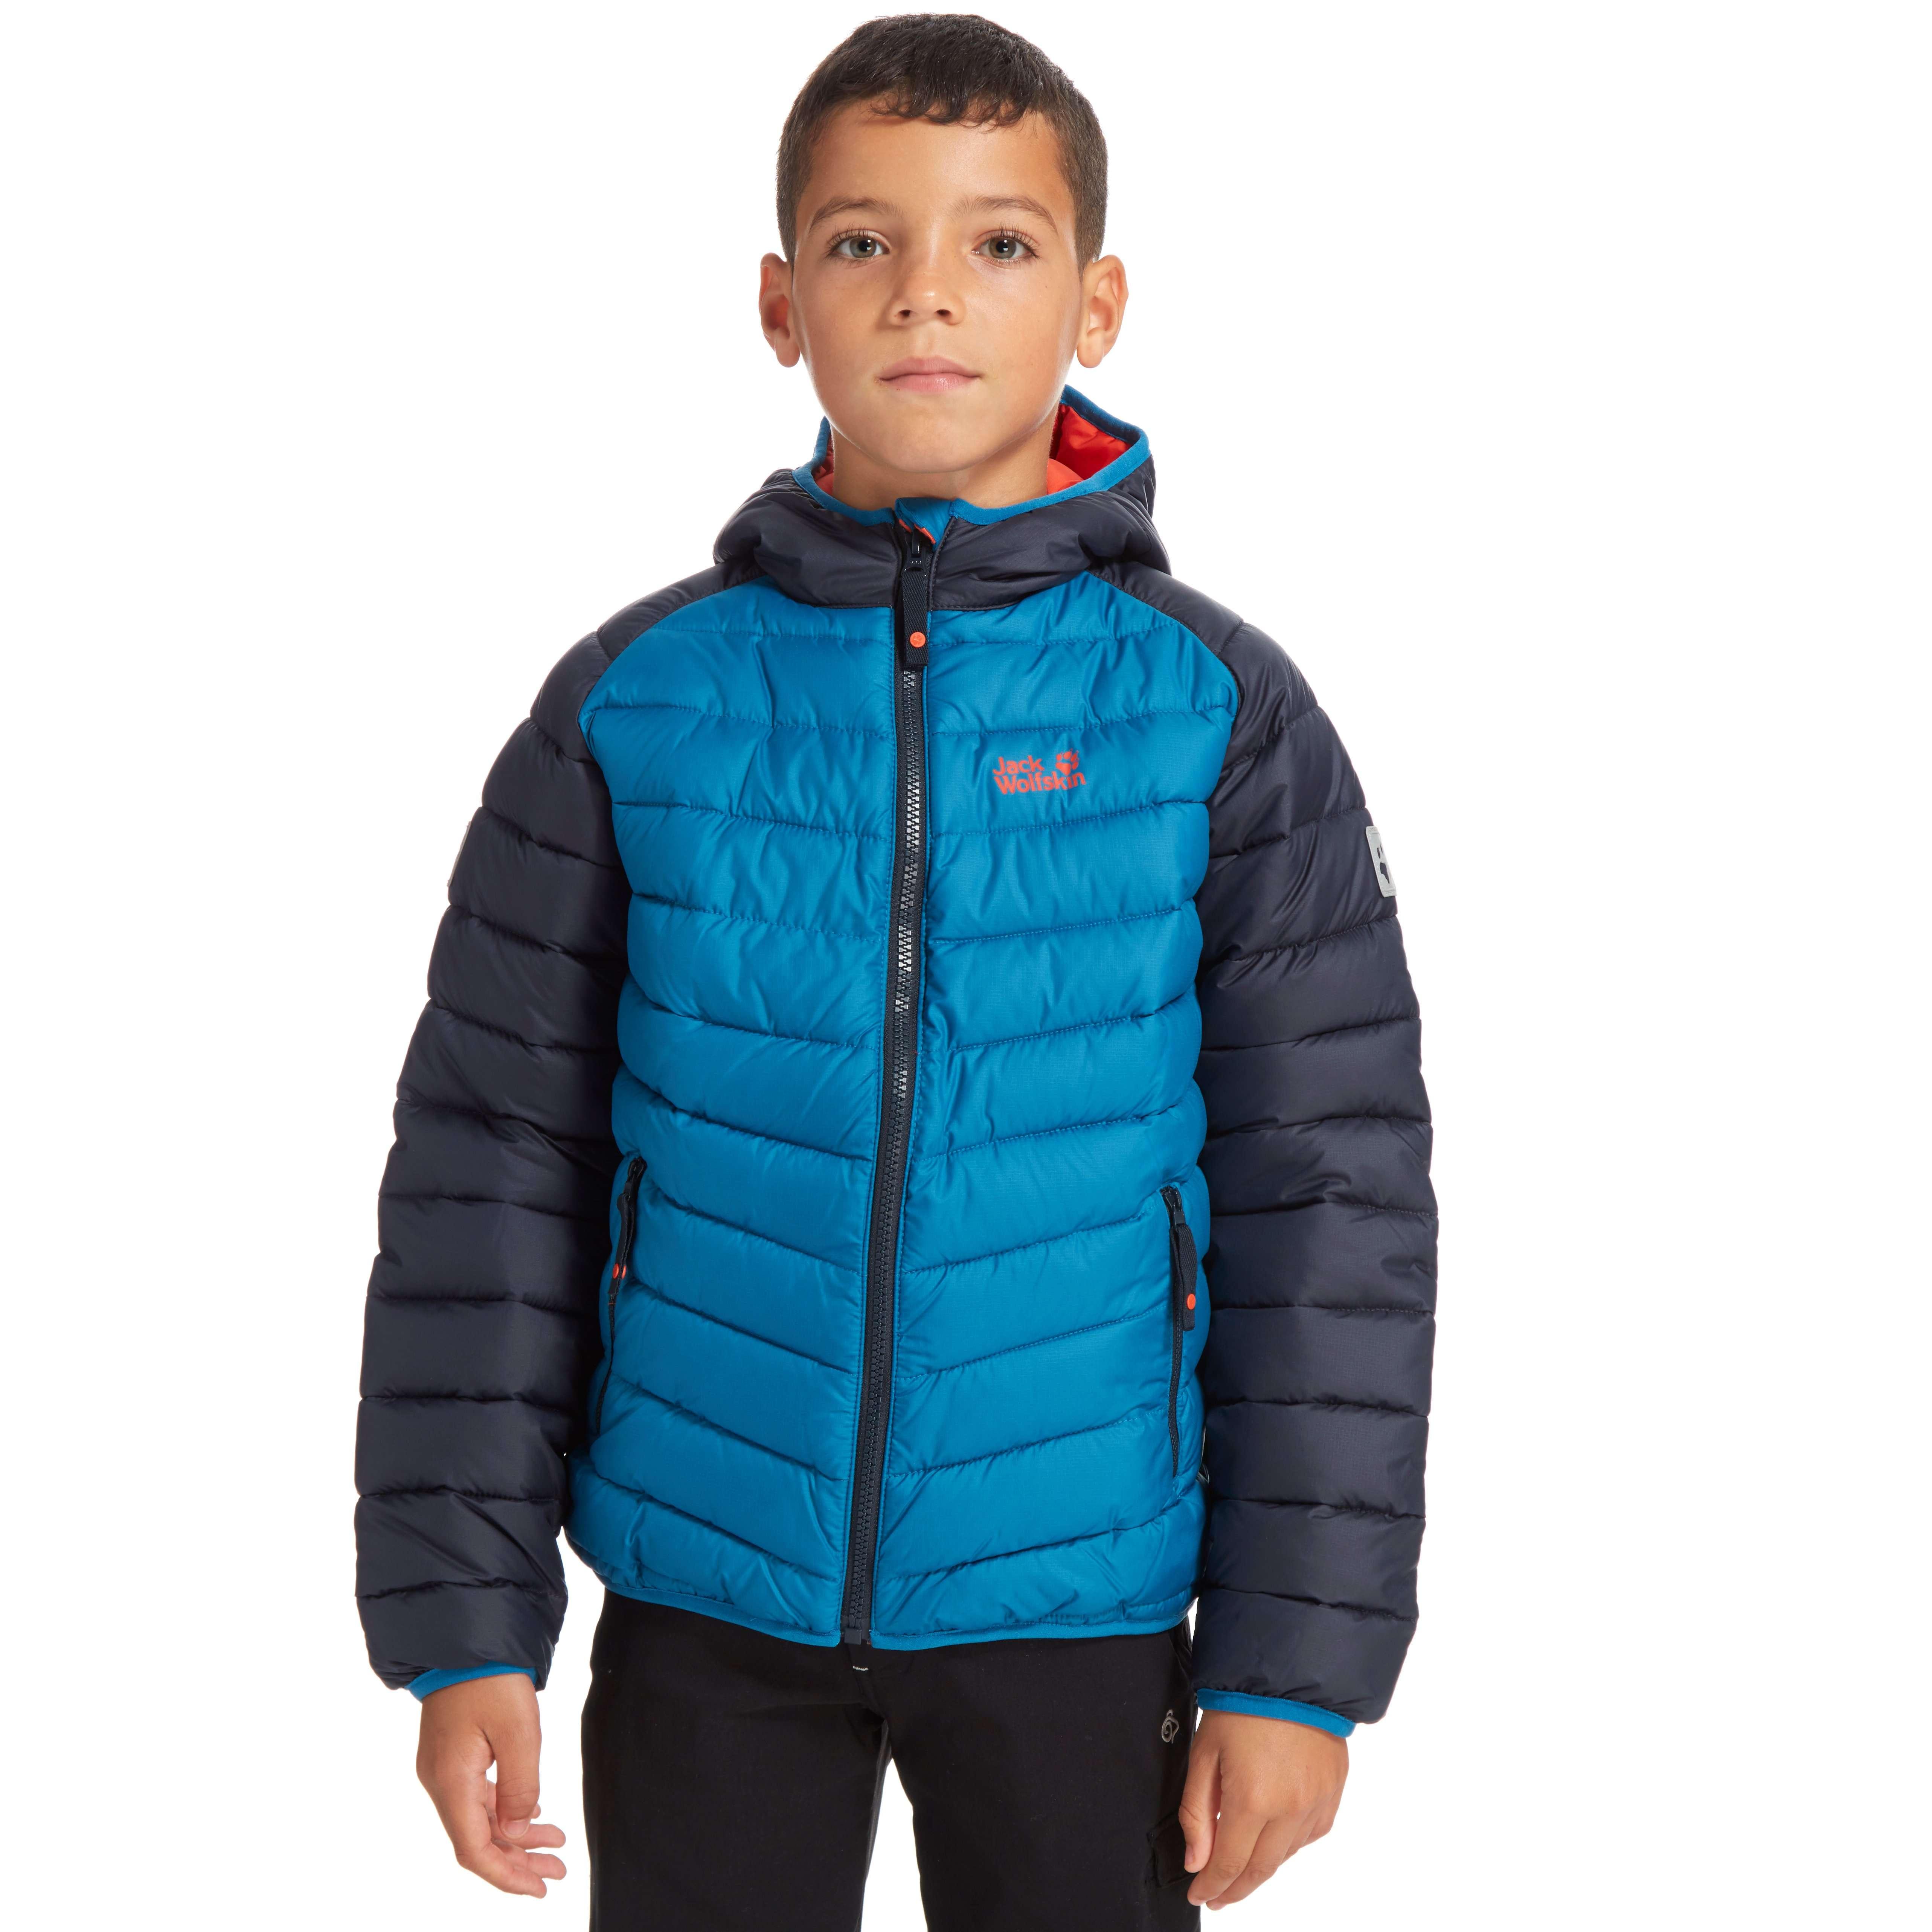 JACK WOLFSKIN Boy's Zenon Insulated Jacket